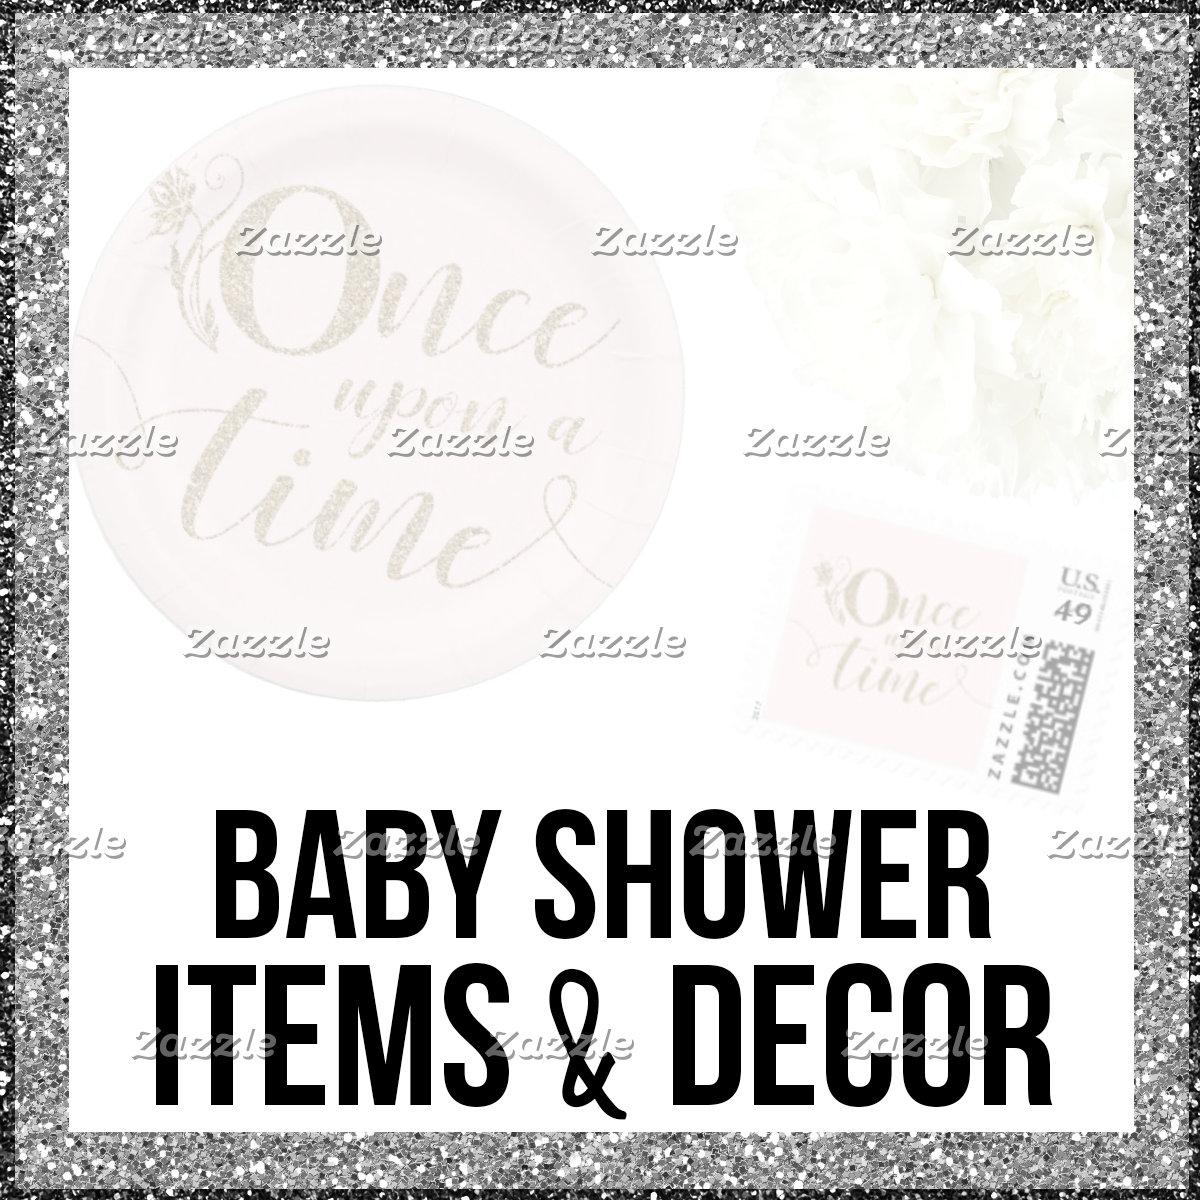 Baby Shower Items & Decor